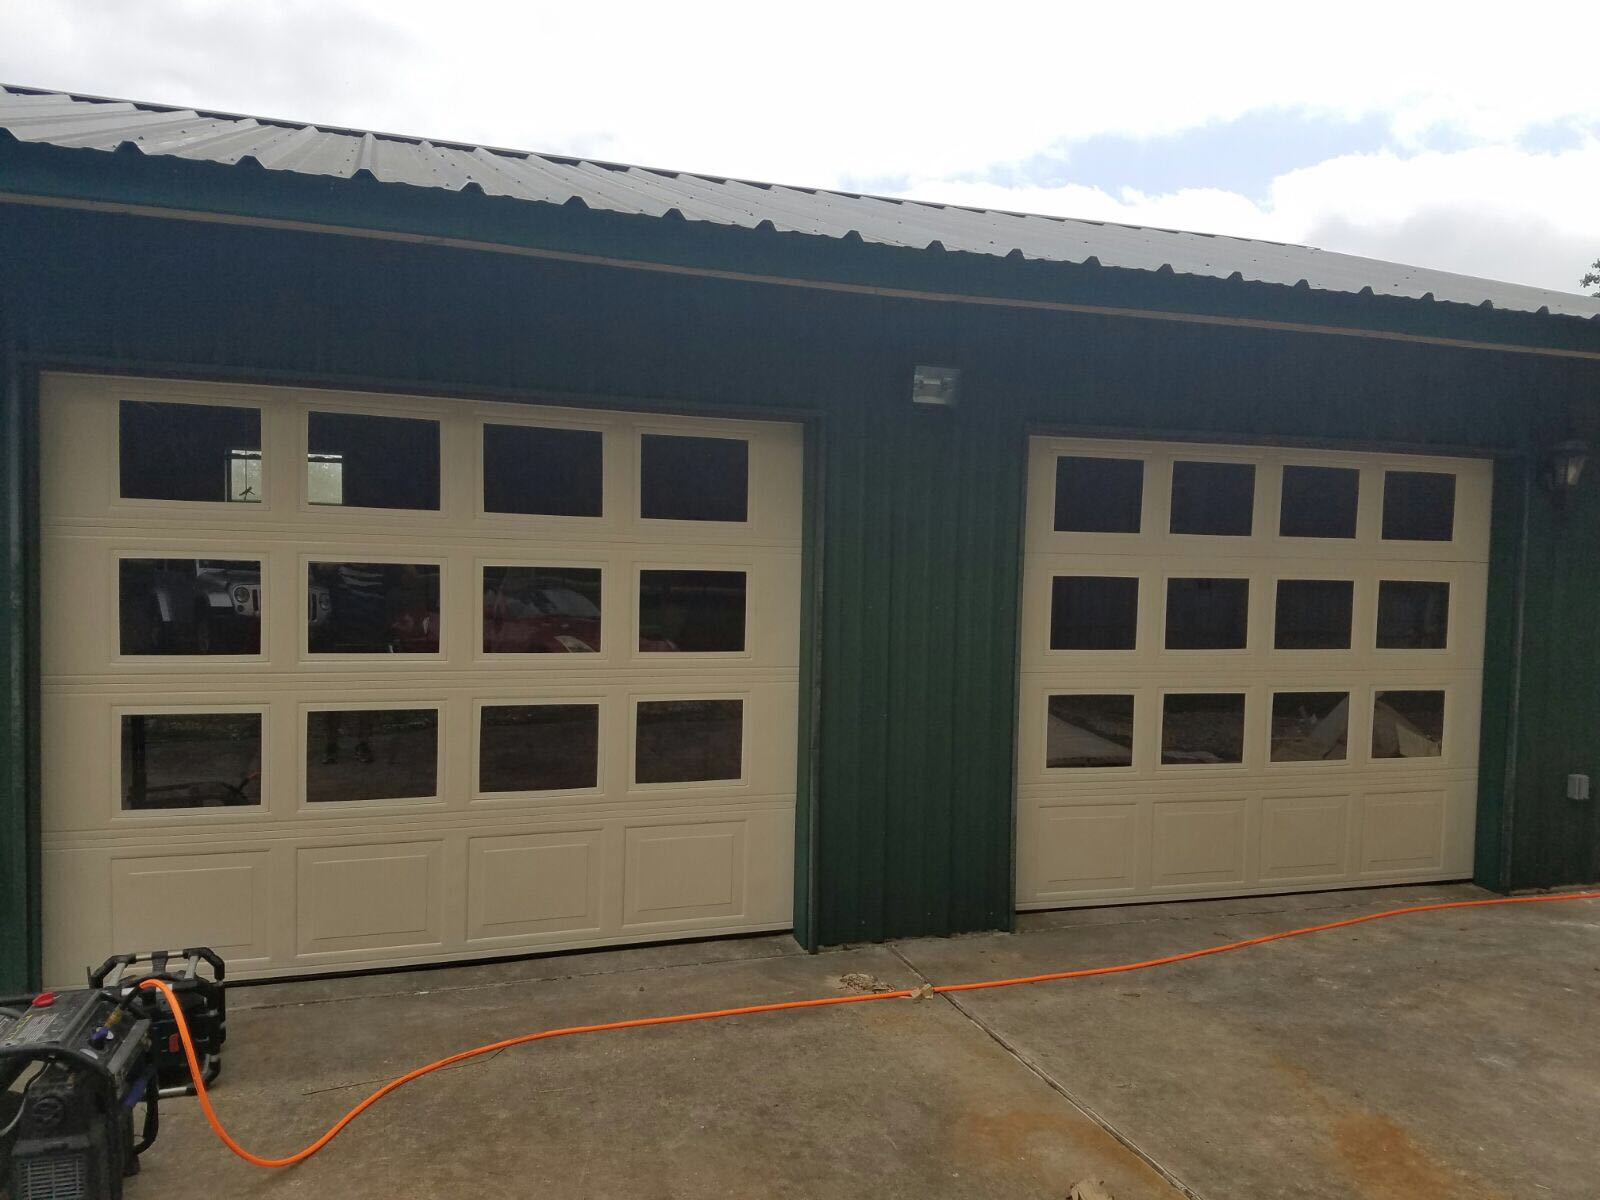 Fair Lawn Garage Door Repair Solutions | Fair Lawn, NJ, 07410 | +1 (201) 917-1258